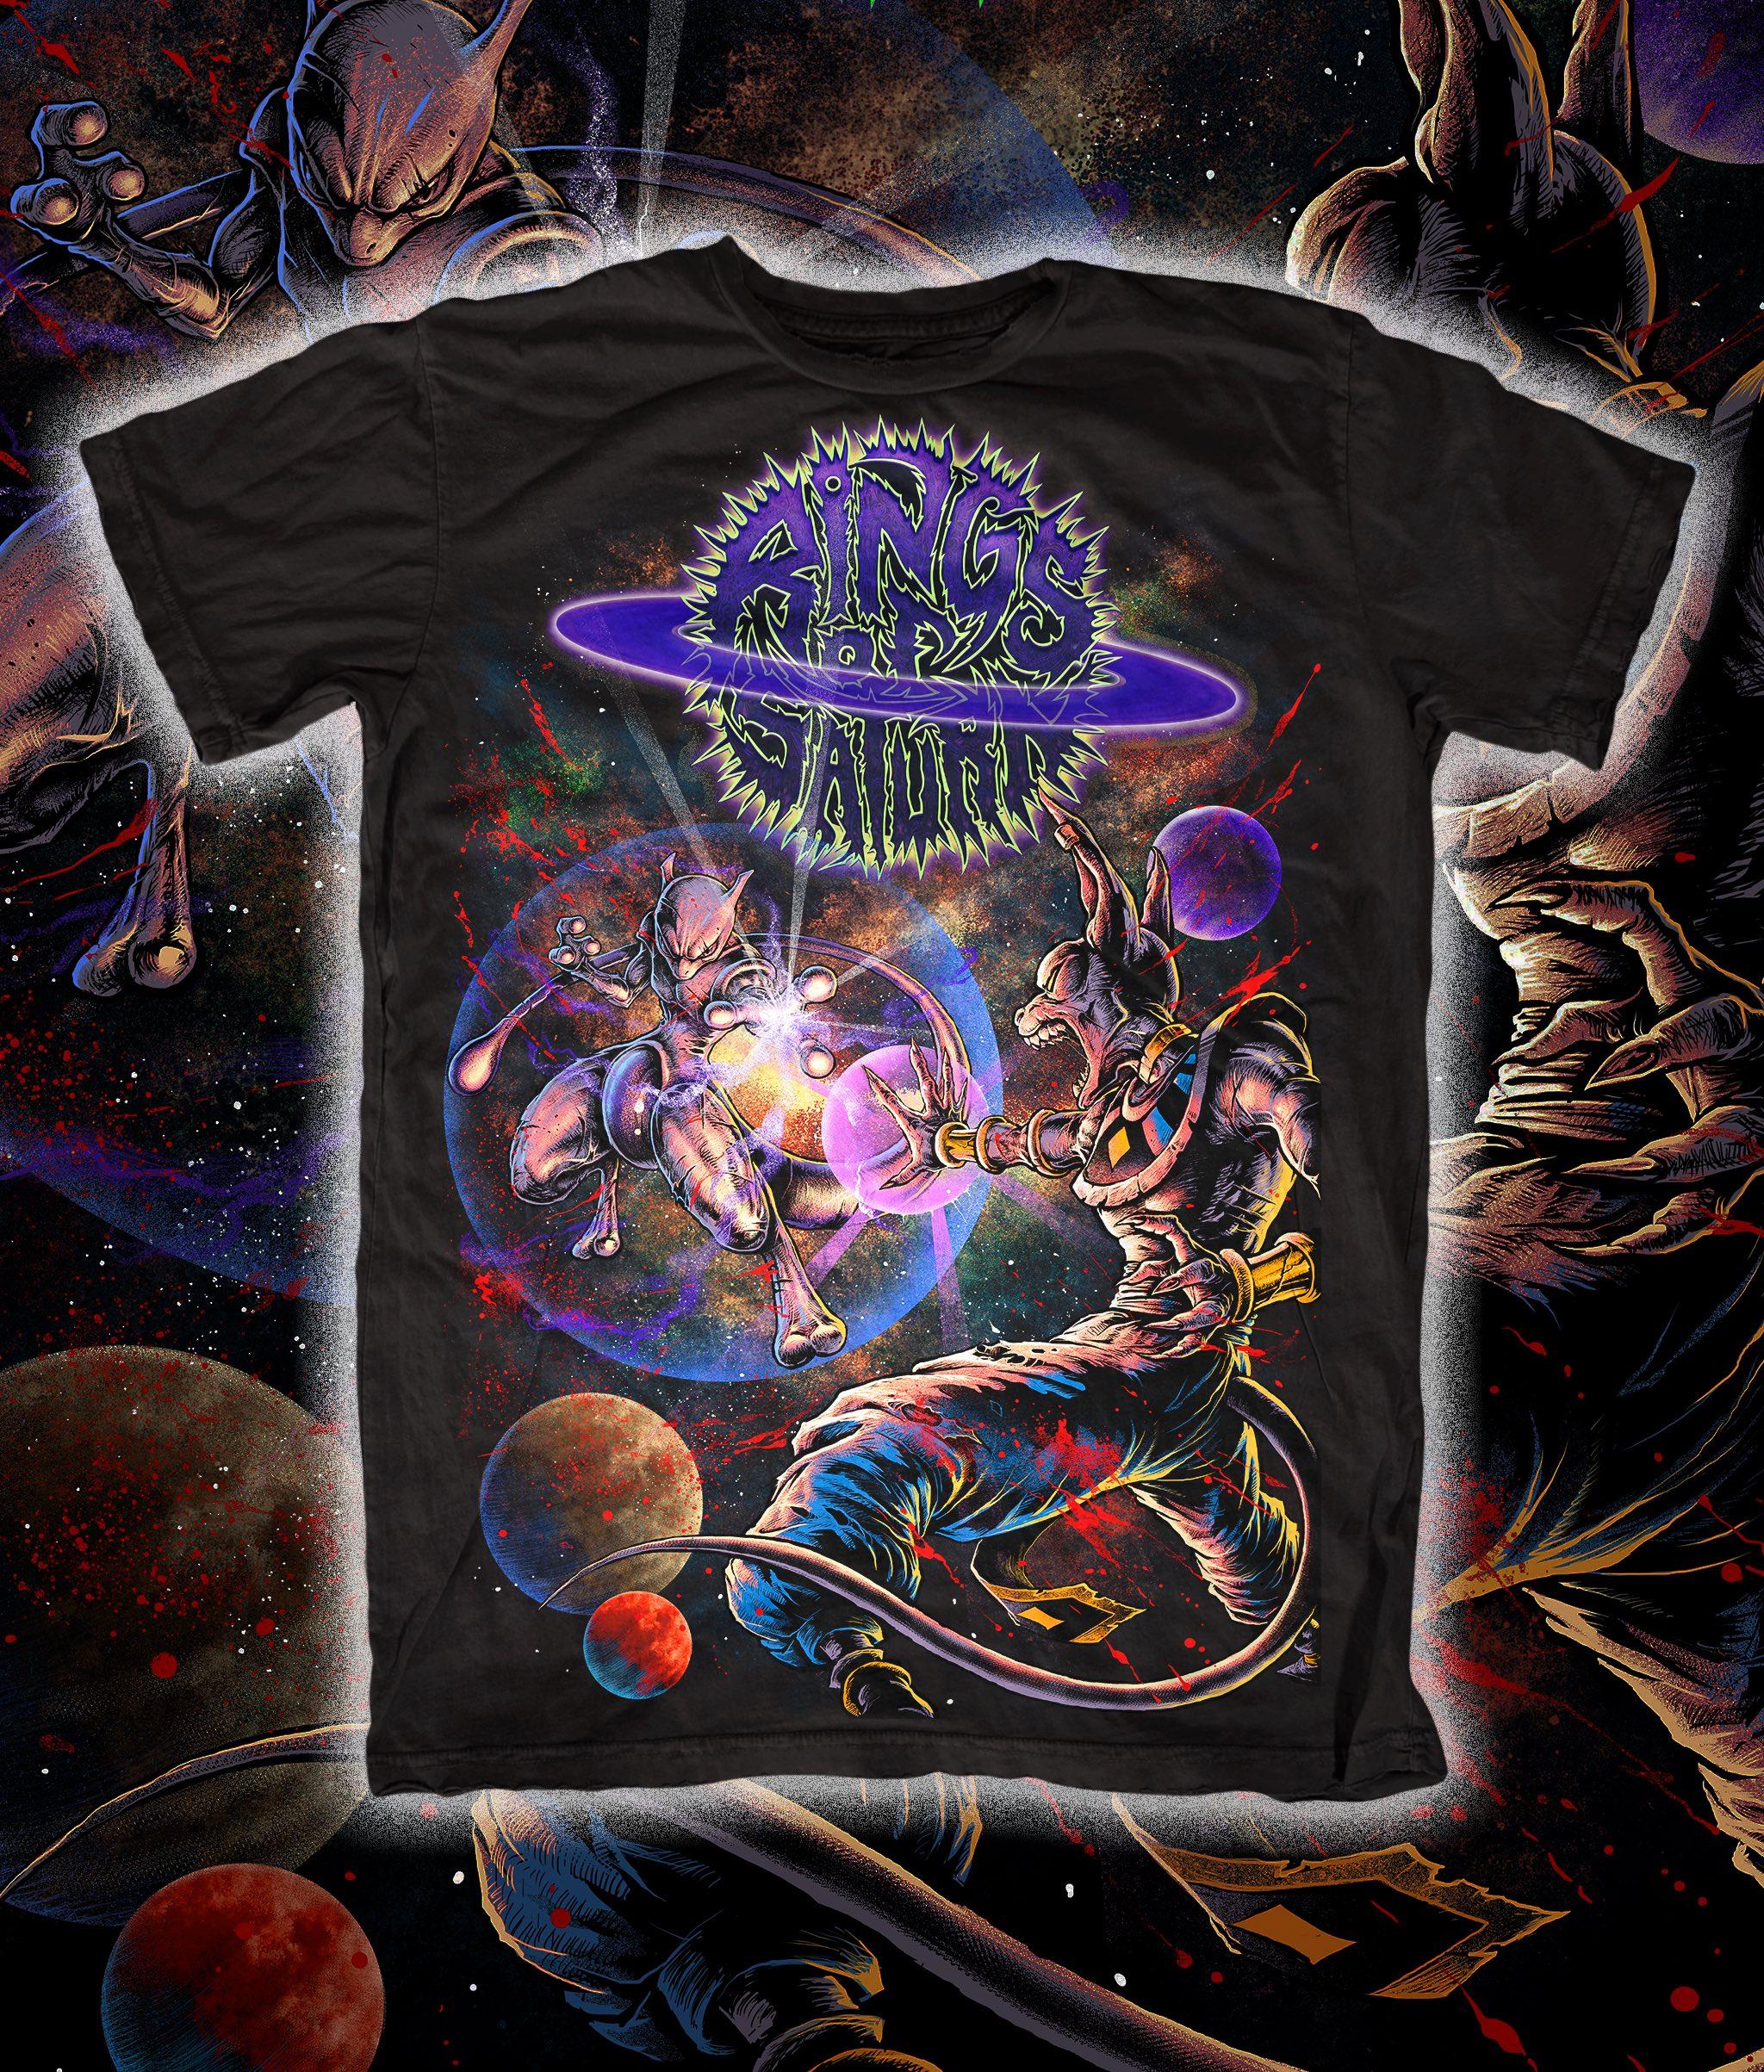 Rings Of Saturn Legendary Warriors T Shirt Rings Of Saturn